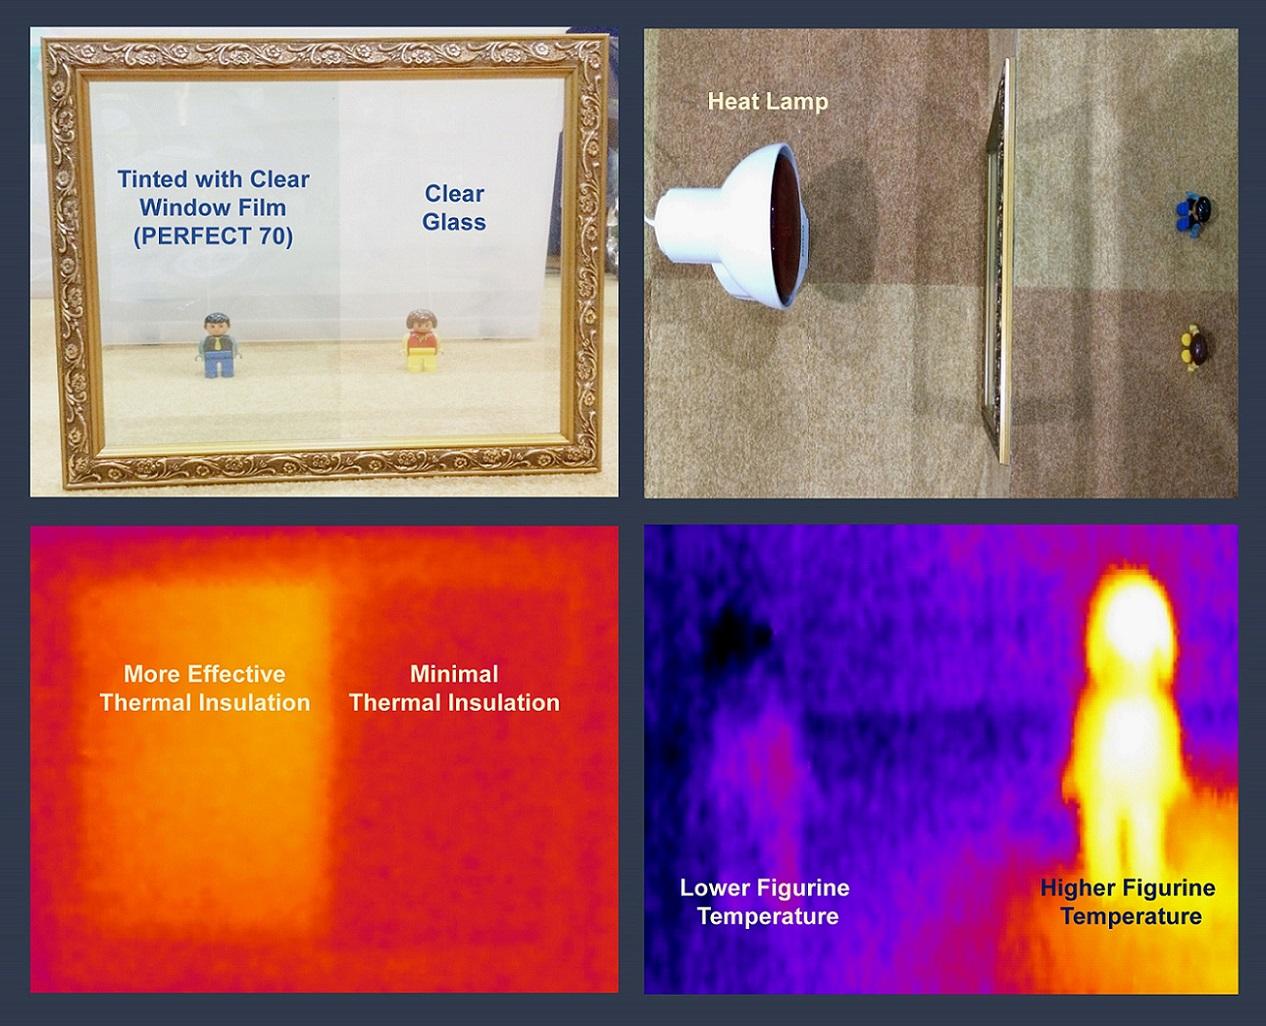 filmtack demonstrates window films heat reduction with thermal imaging technology filmtack. Black Bedroom Furniture Sets. Home Design Ideas